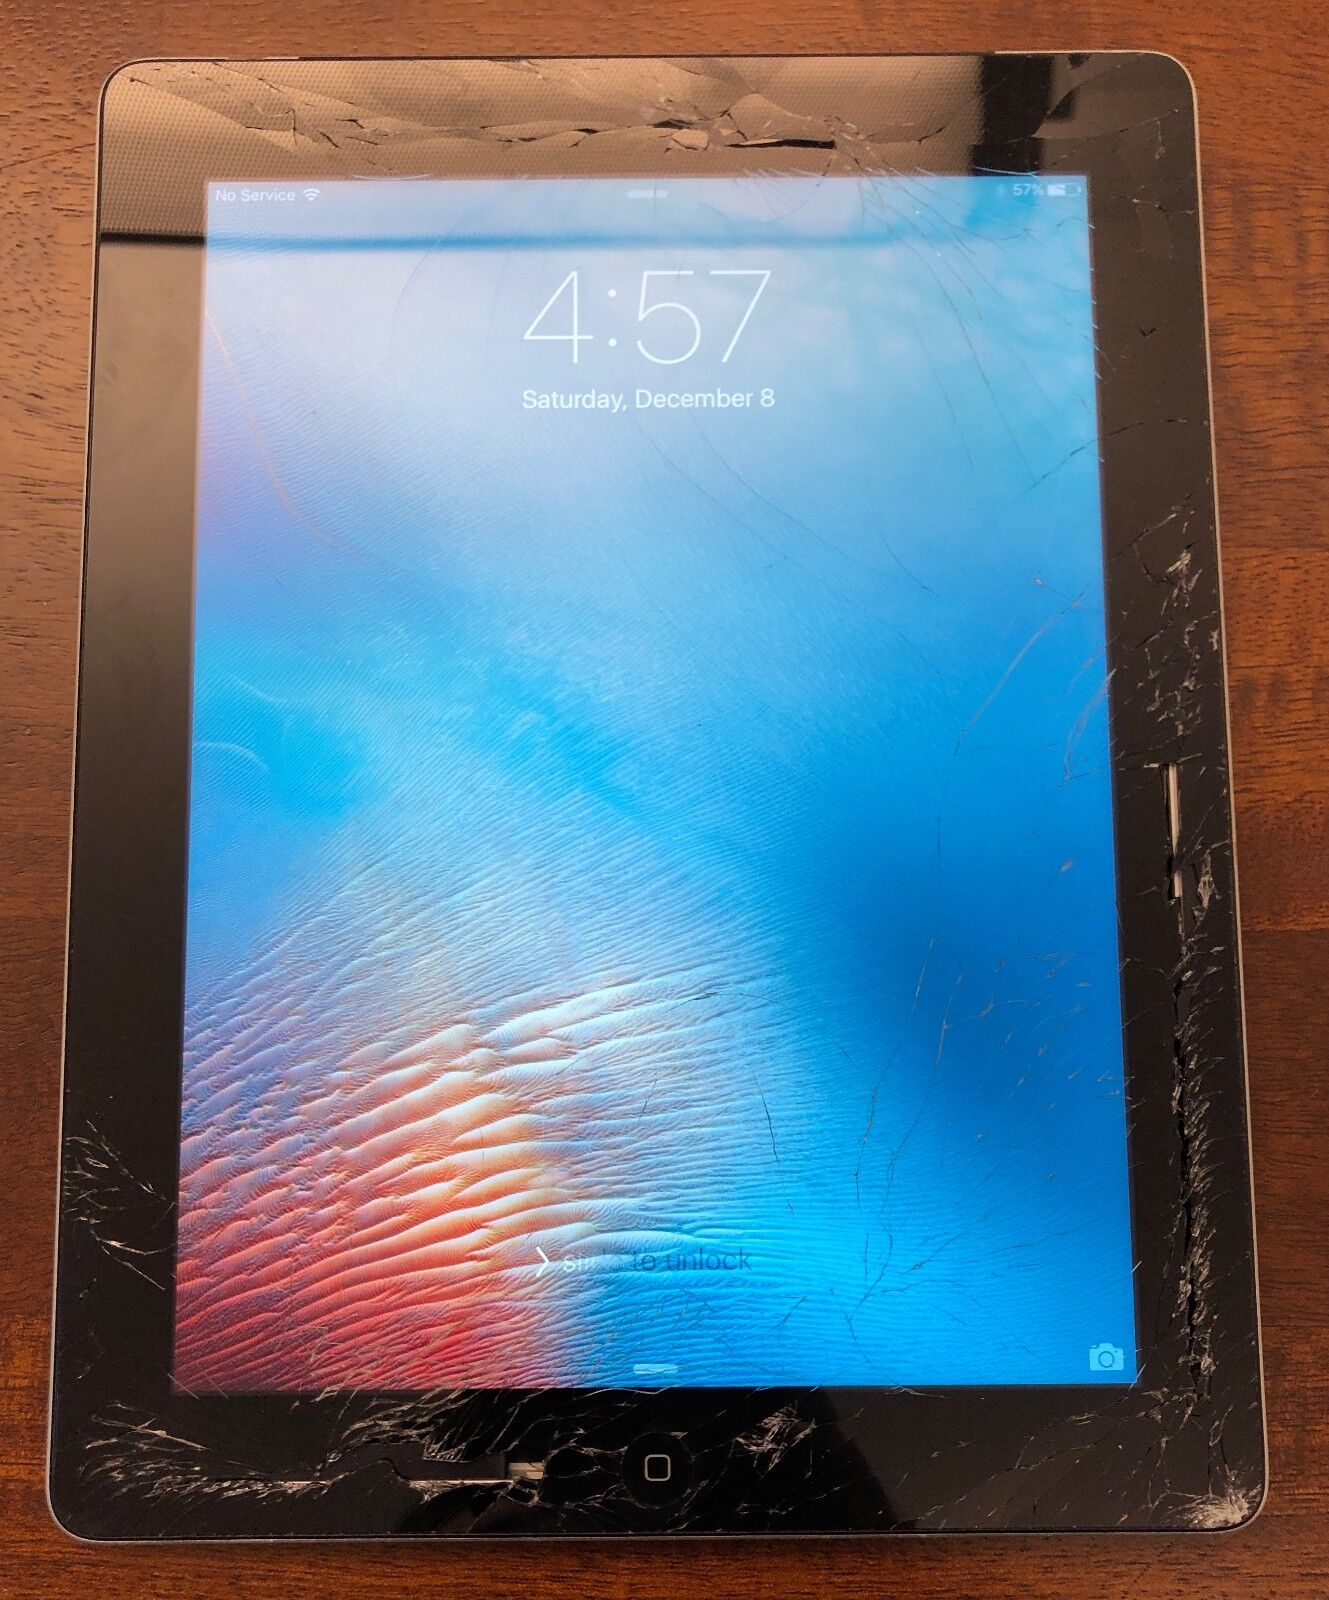 Working Apple iPad 3rd Gen. 64GB, Wi-Fi + Cellular (AT&T), 9.7in - Black